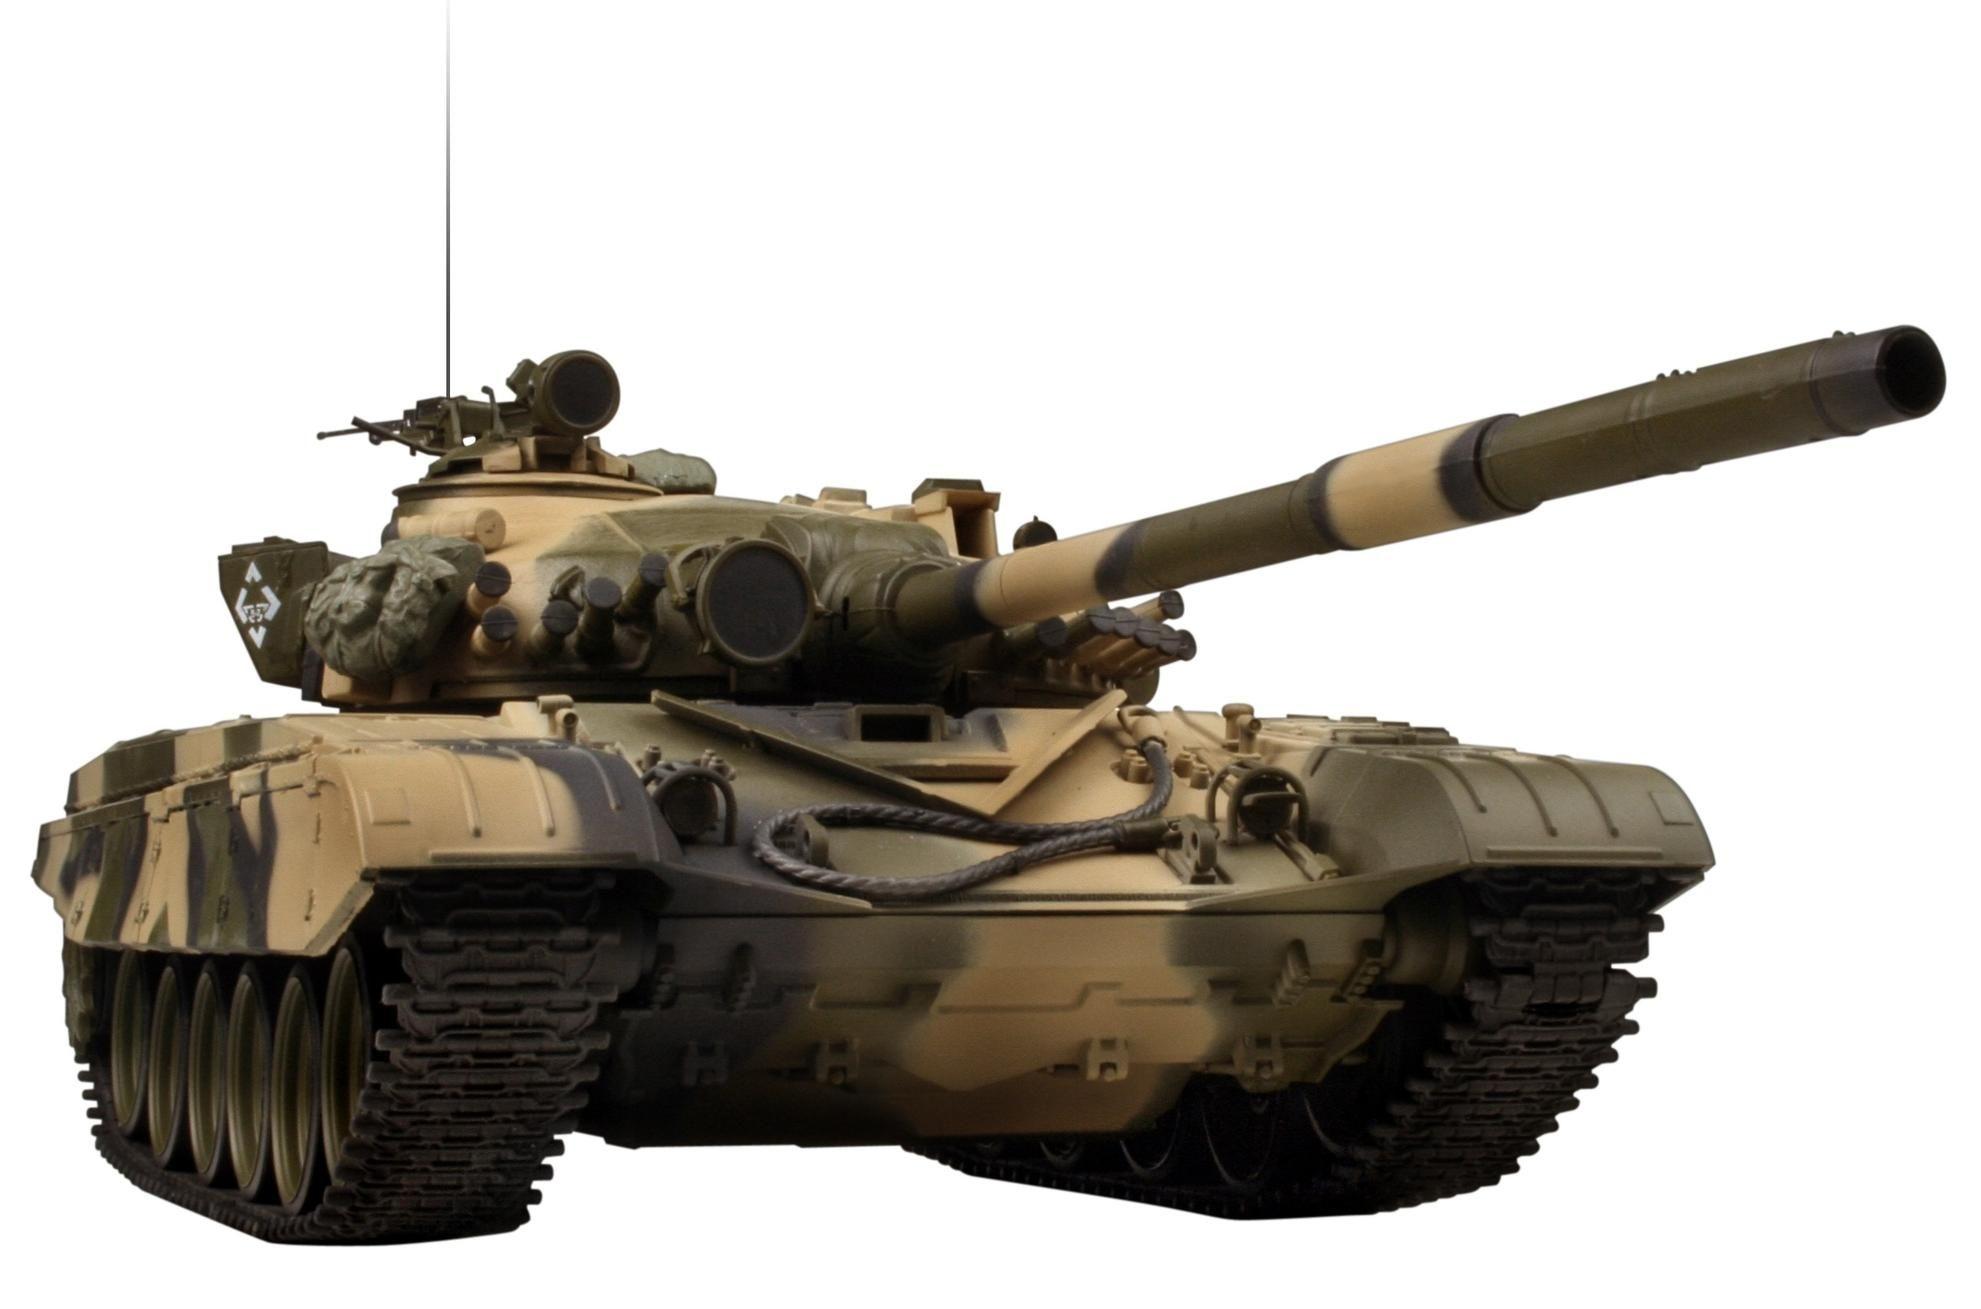 tank dream meaning, dream about tank, tank dream interpretation, seeing in a dream tank